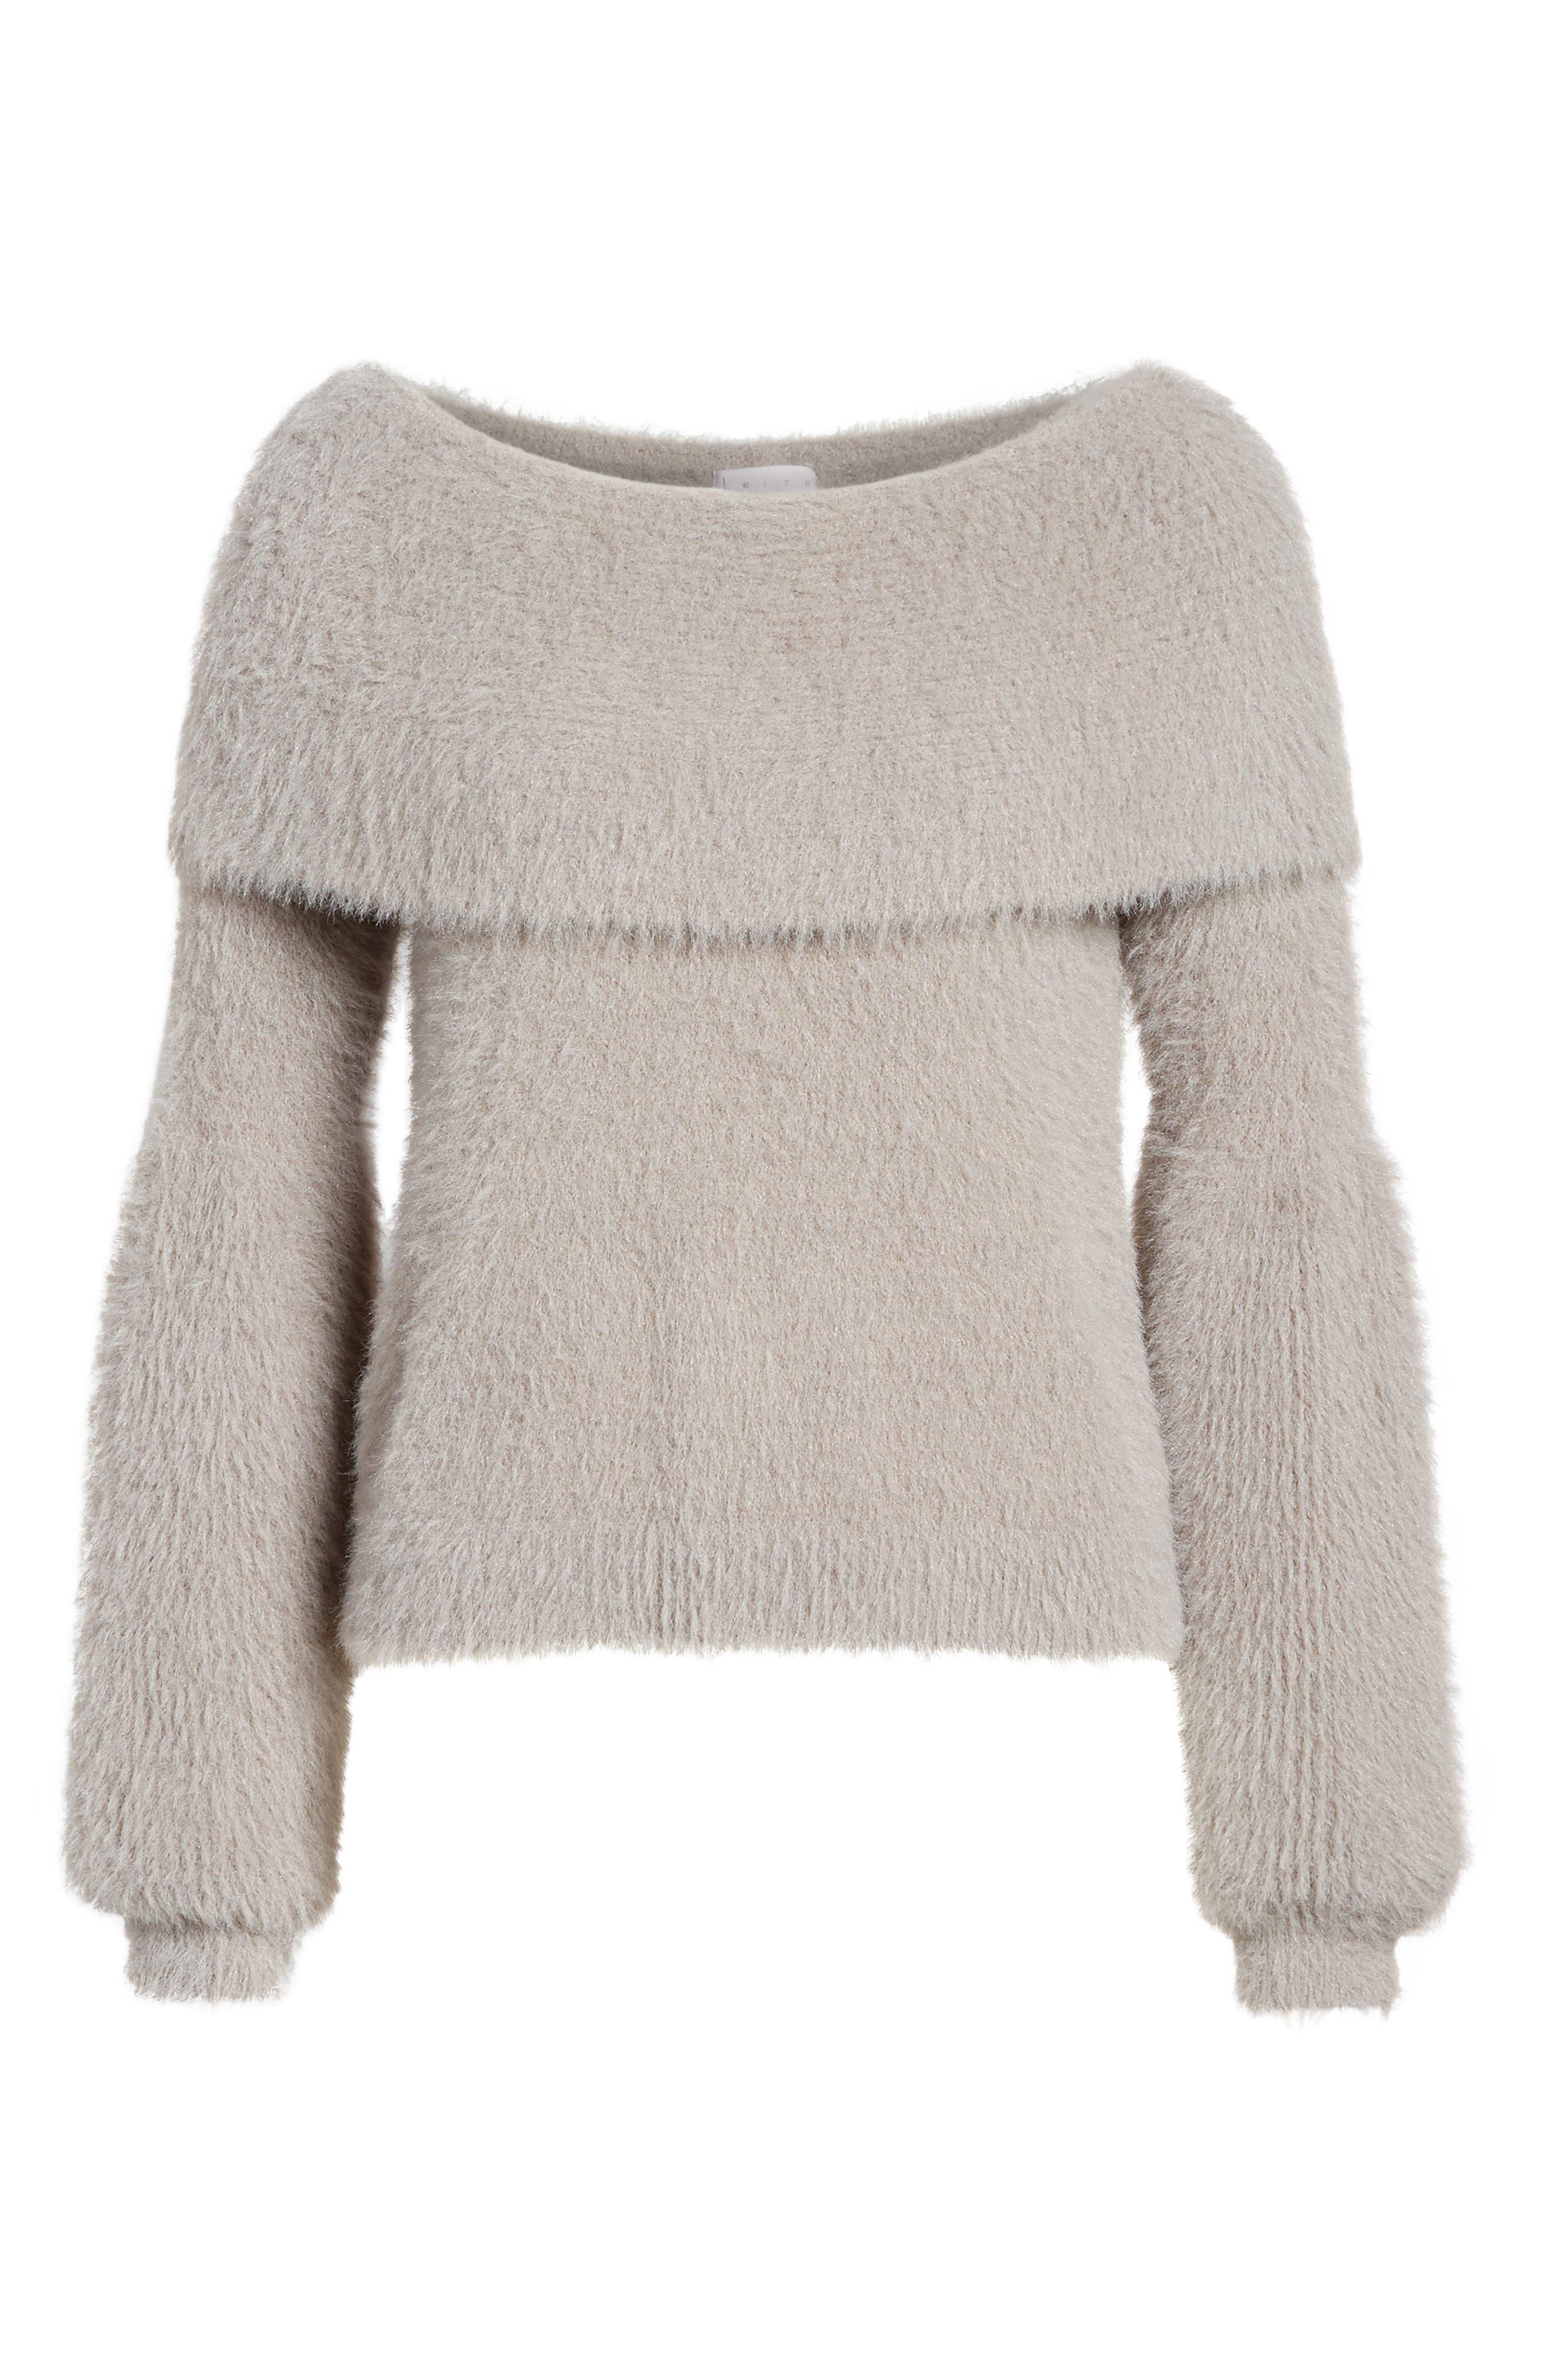 Off the Shoulder Sweater,                             Alternate thumbnail 6, color,                             Grey Cloudburst